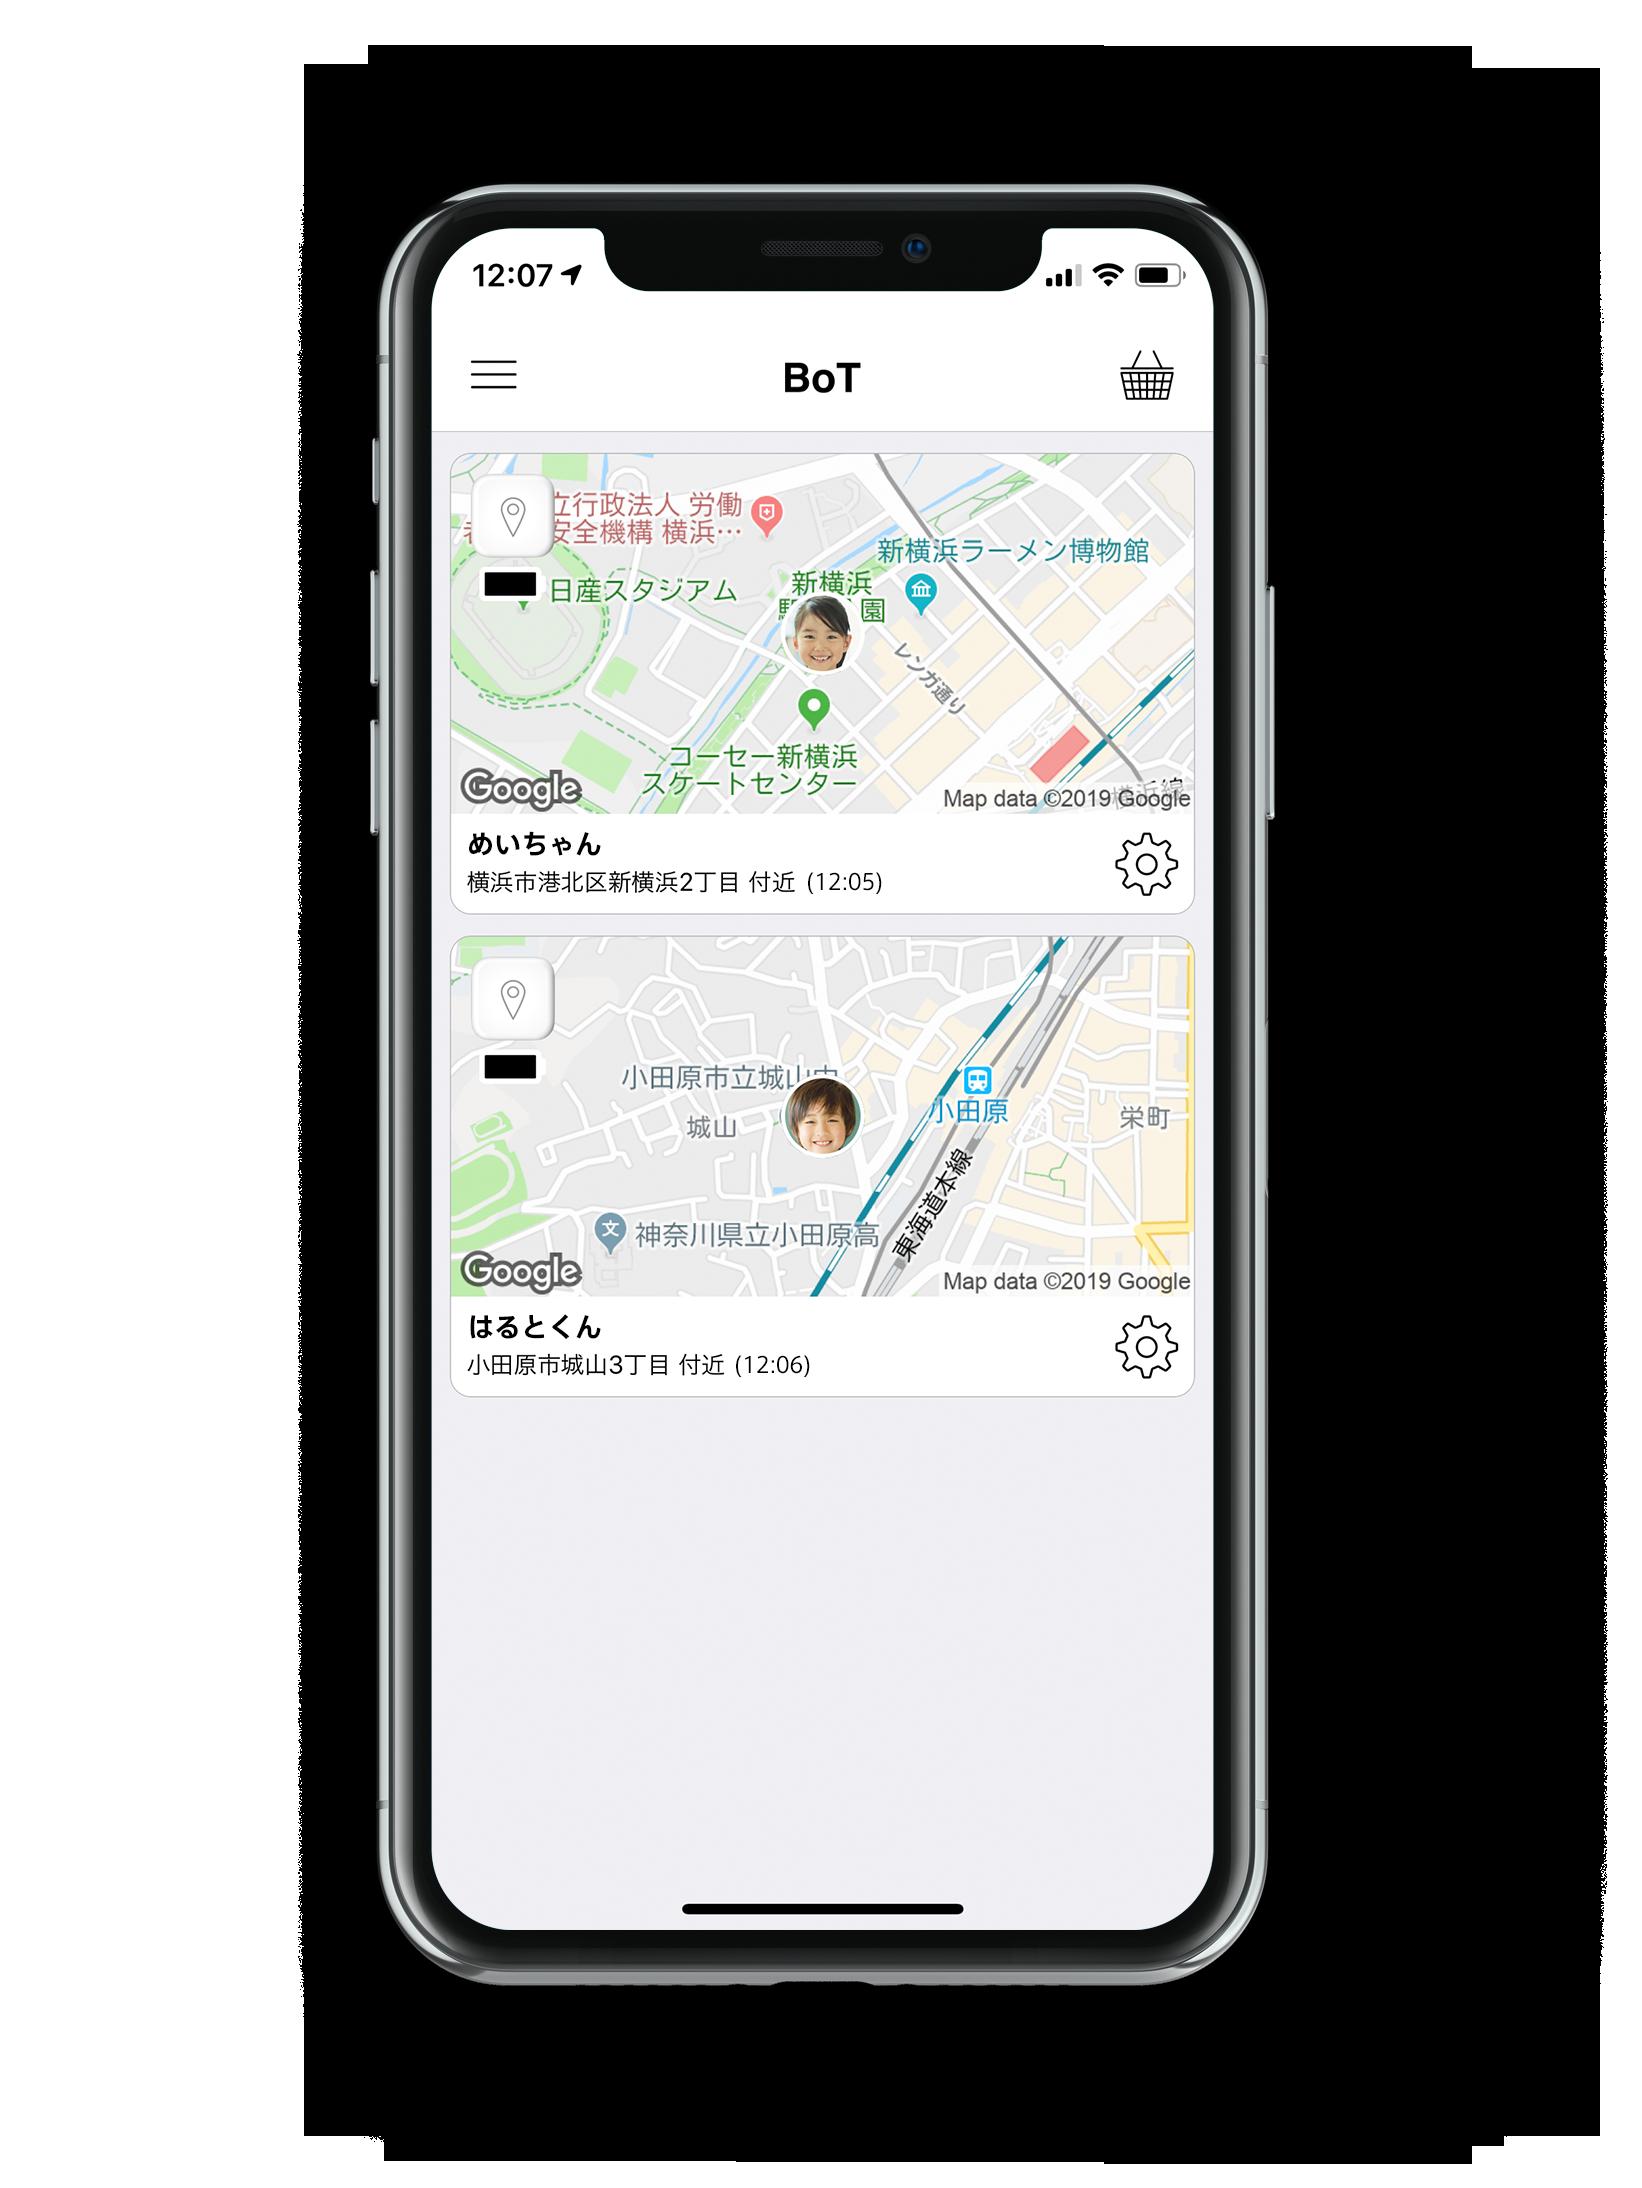 GPS BoT アプリで、複数の子供を同時に見守るスマートフォン